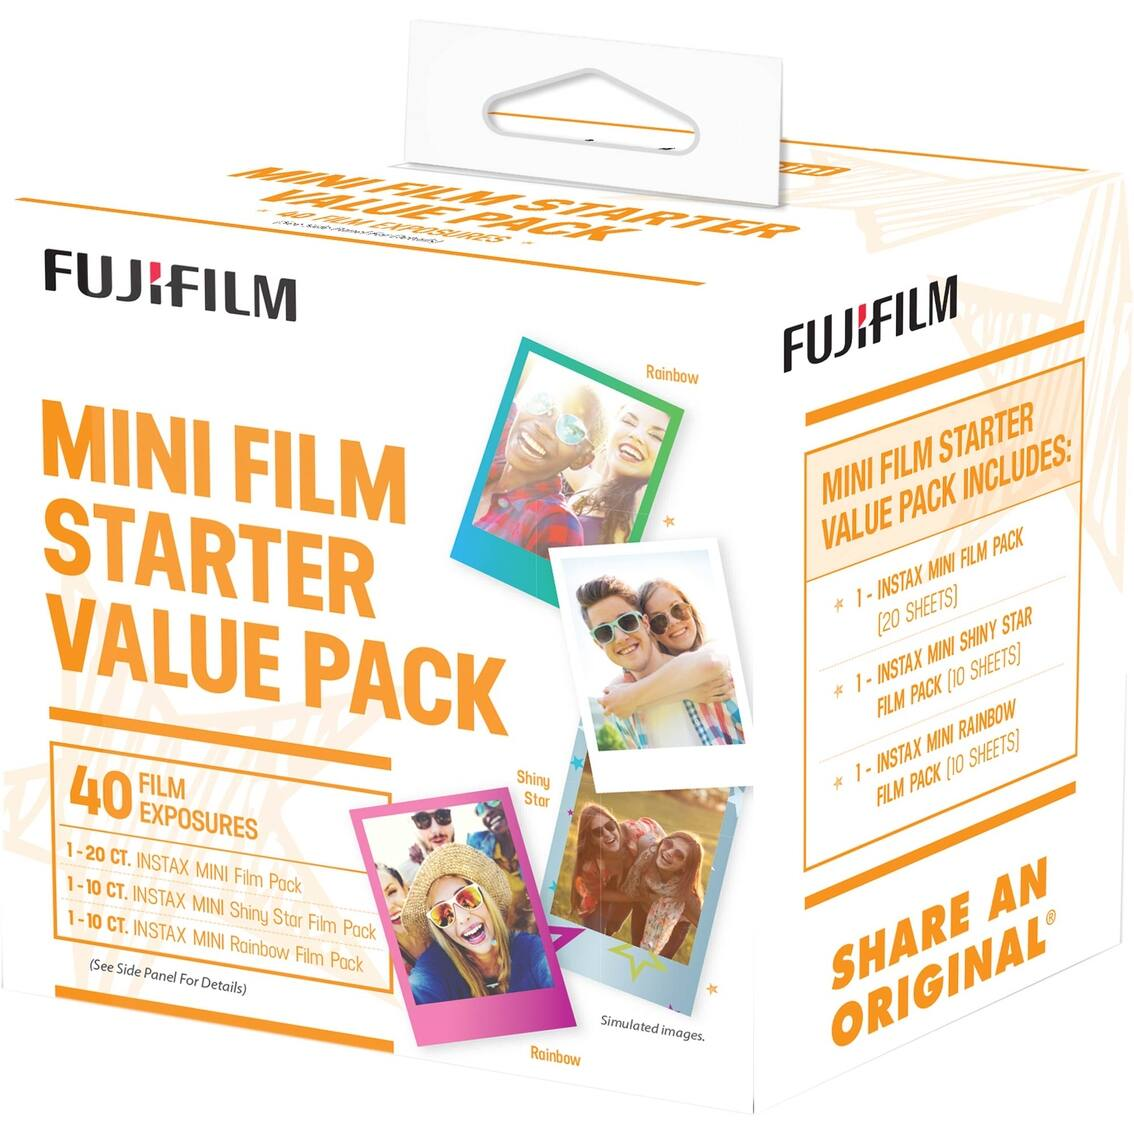 FujiFilm Instax Mini Film Starter Kit 40 Pk (20 regular, 10 rainbow, 10 star) - $17.99 shipped - AAFES